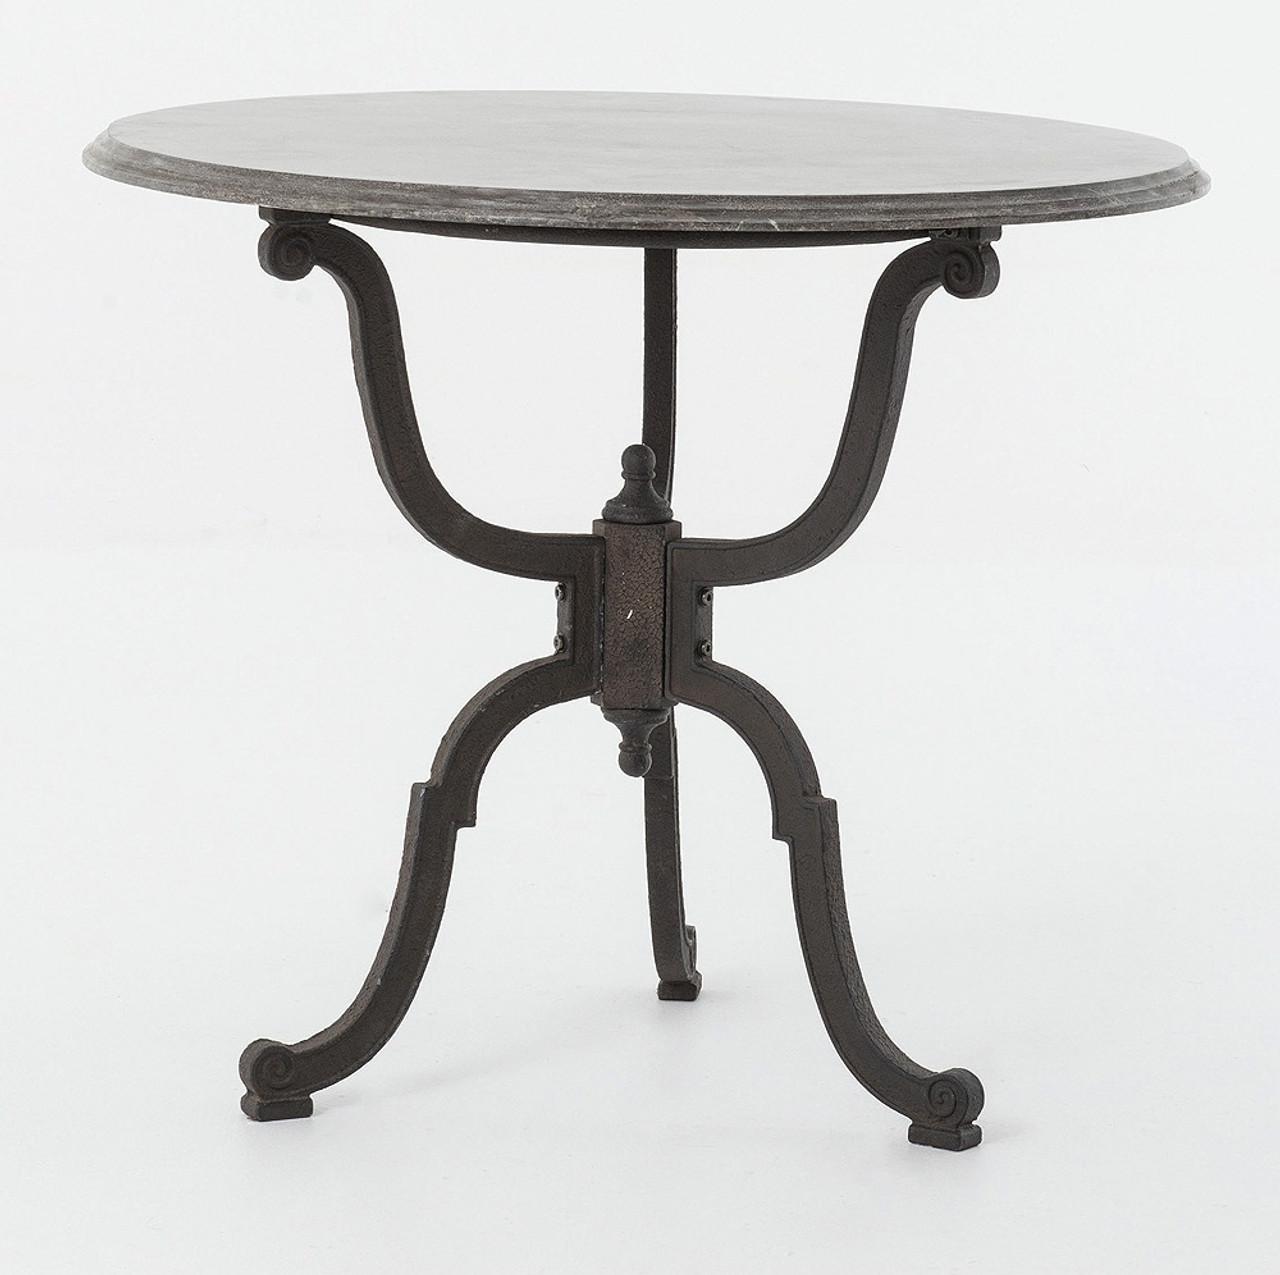 Attirant French Industrial Iron + Bluestone Bistro Round Pedestal Table